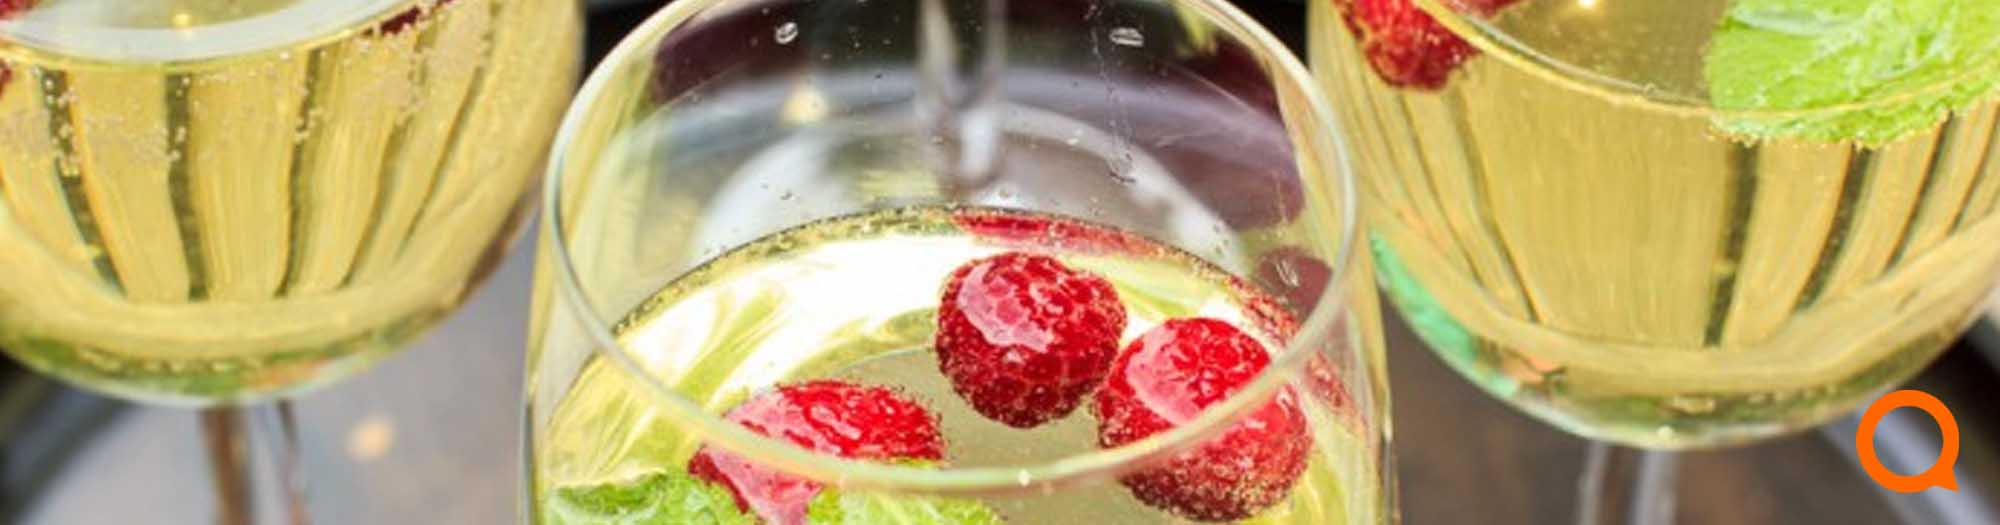 Overige mousserende wijnen